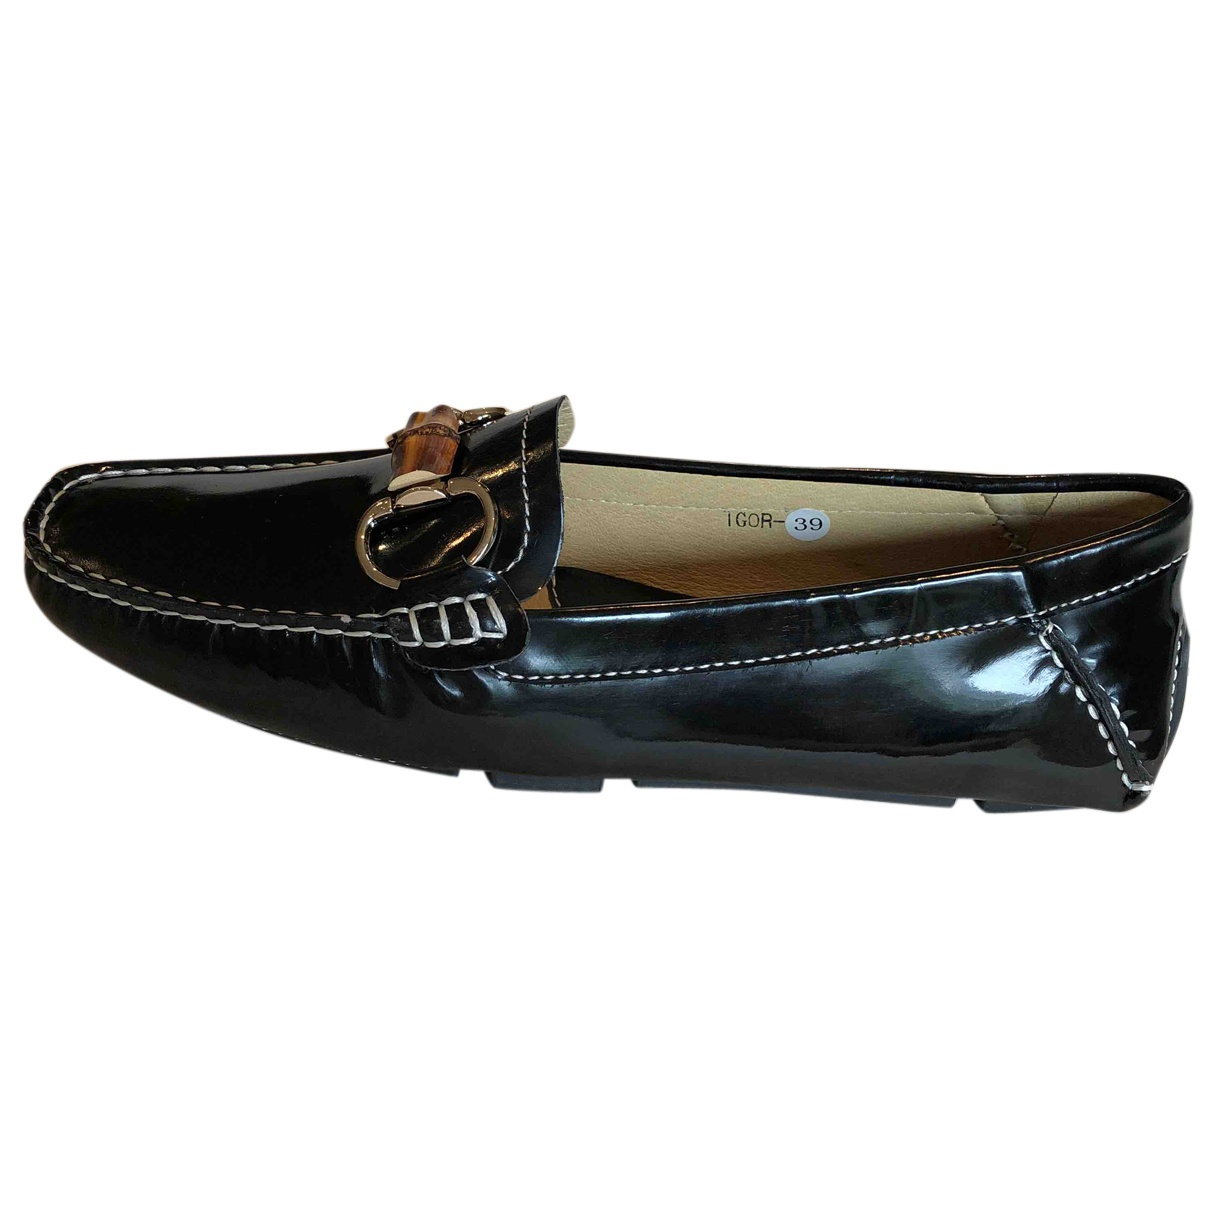 Lk Bennett N Black Patent leather Flats for Women 39 EU